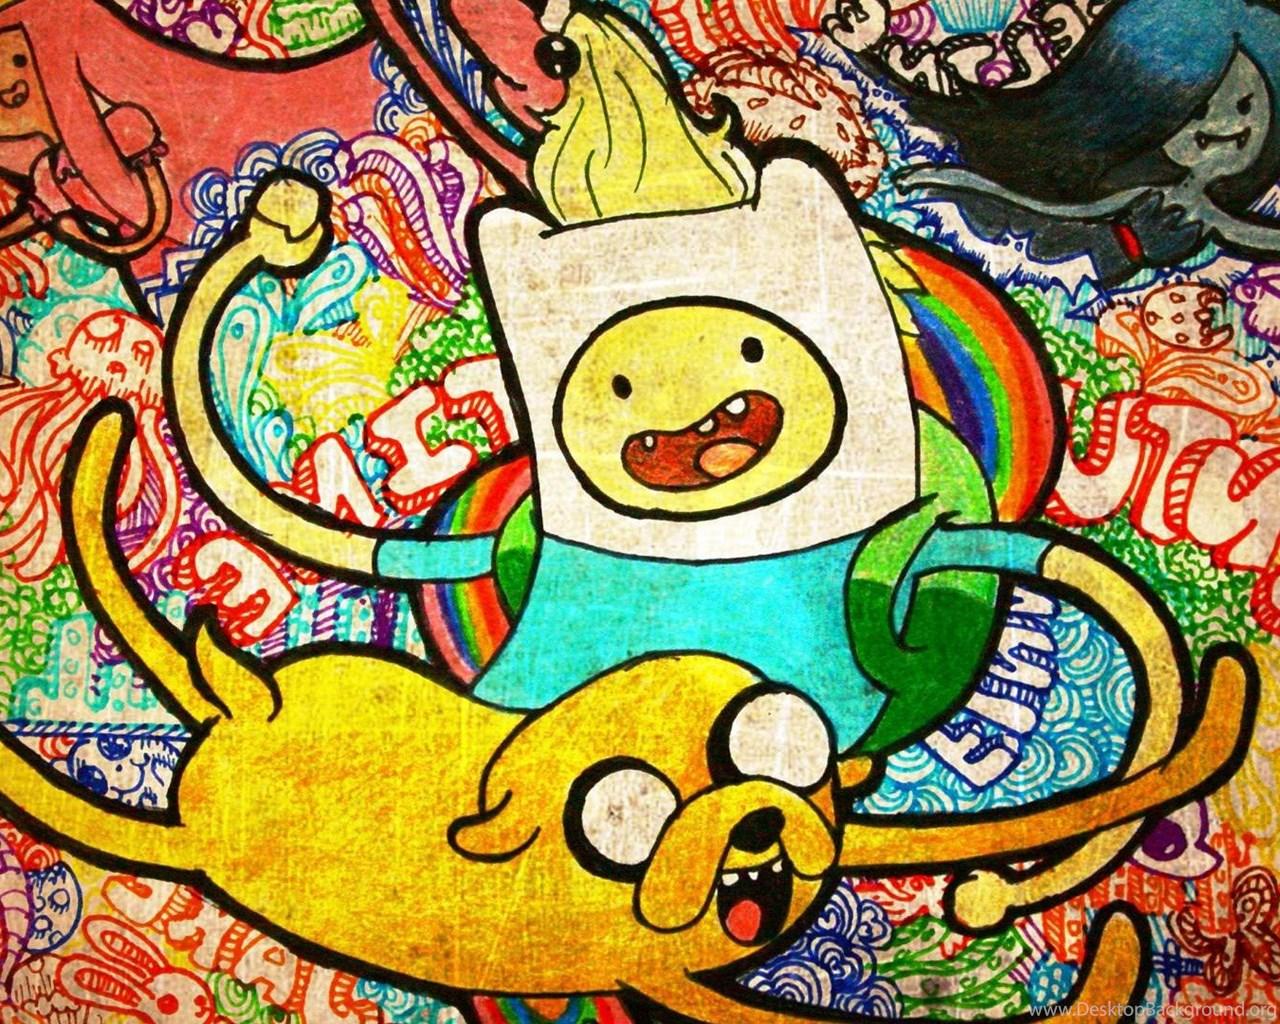 Adventure Time Wallpaper, Graffiti HD Wallpapers Desktop